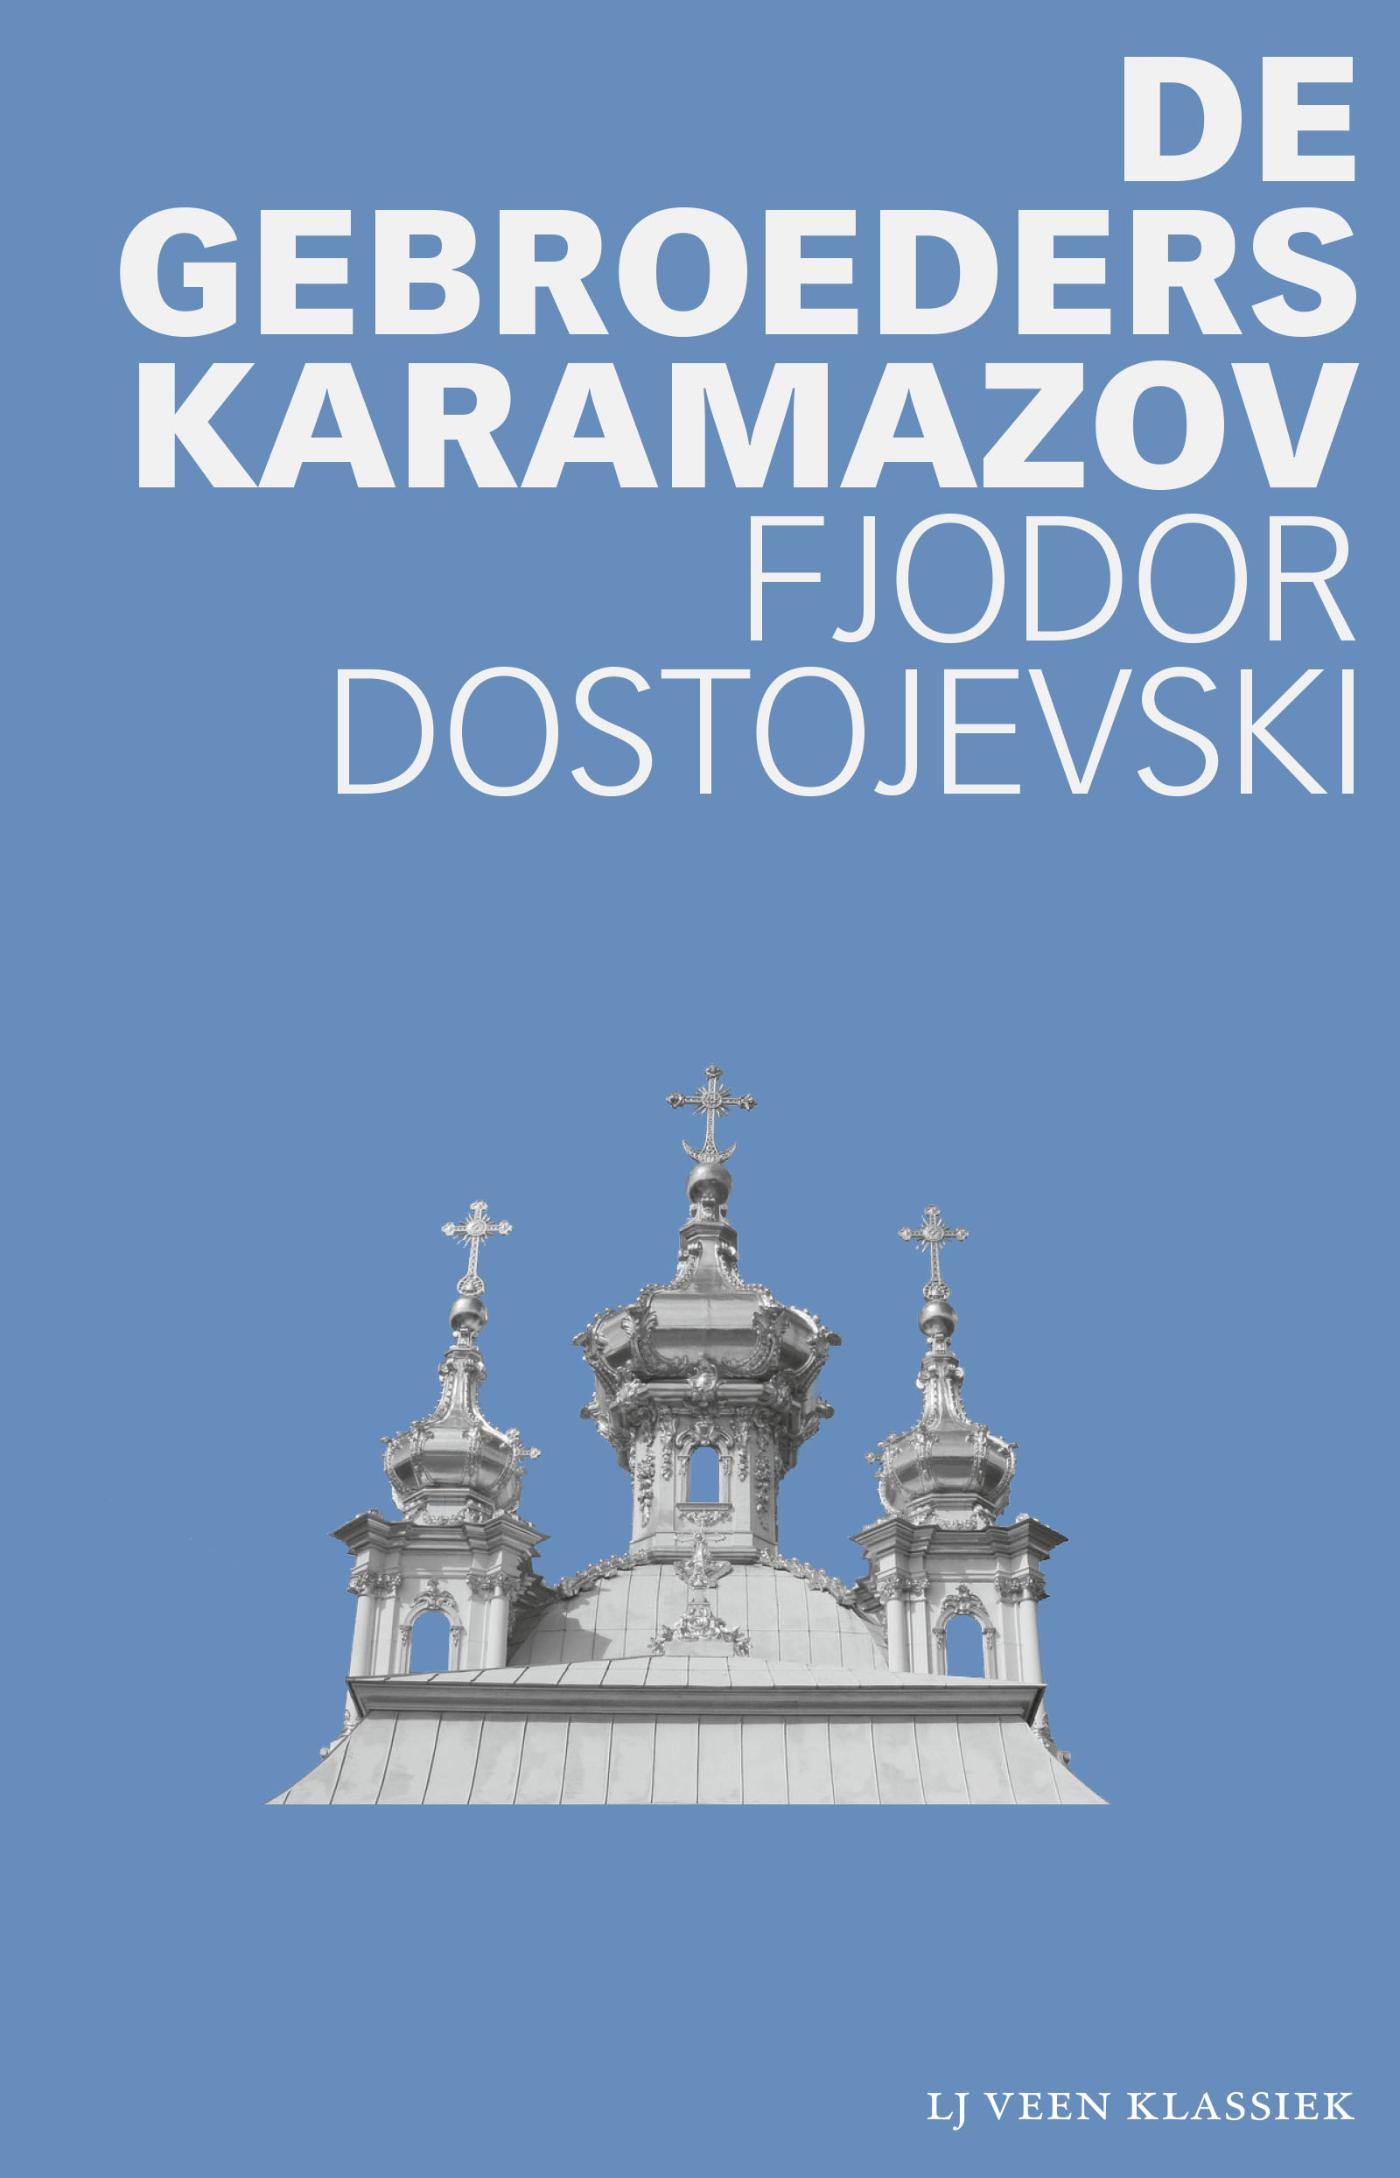 Fjodor Dostojevski - De gebroeders Karamazov